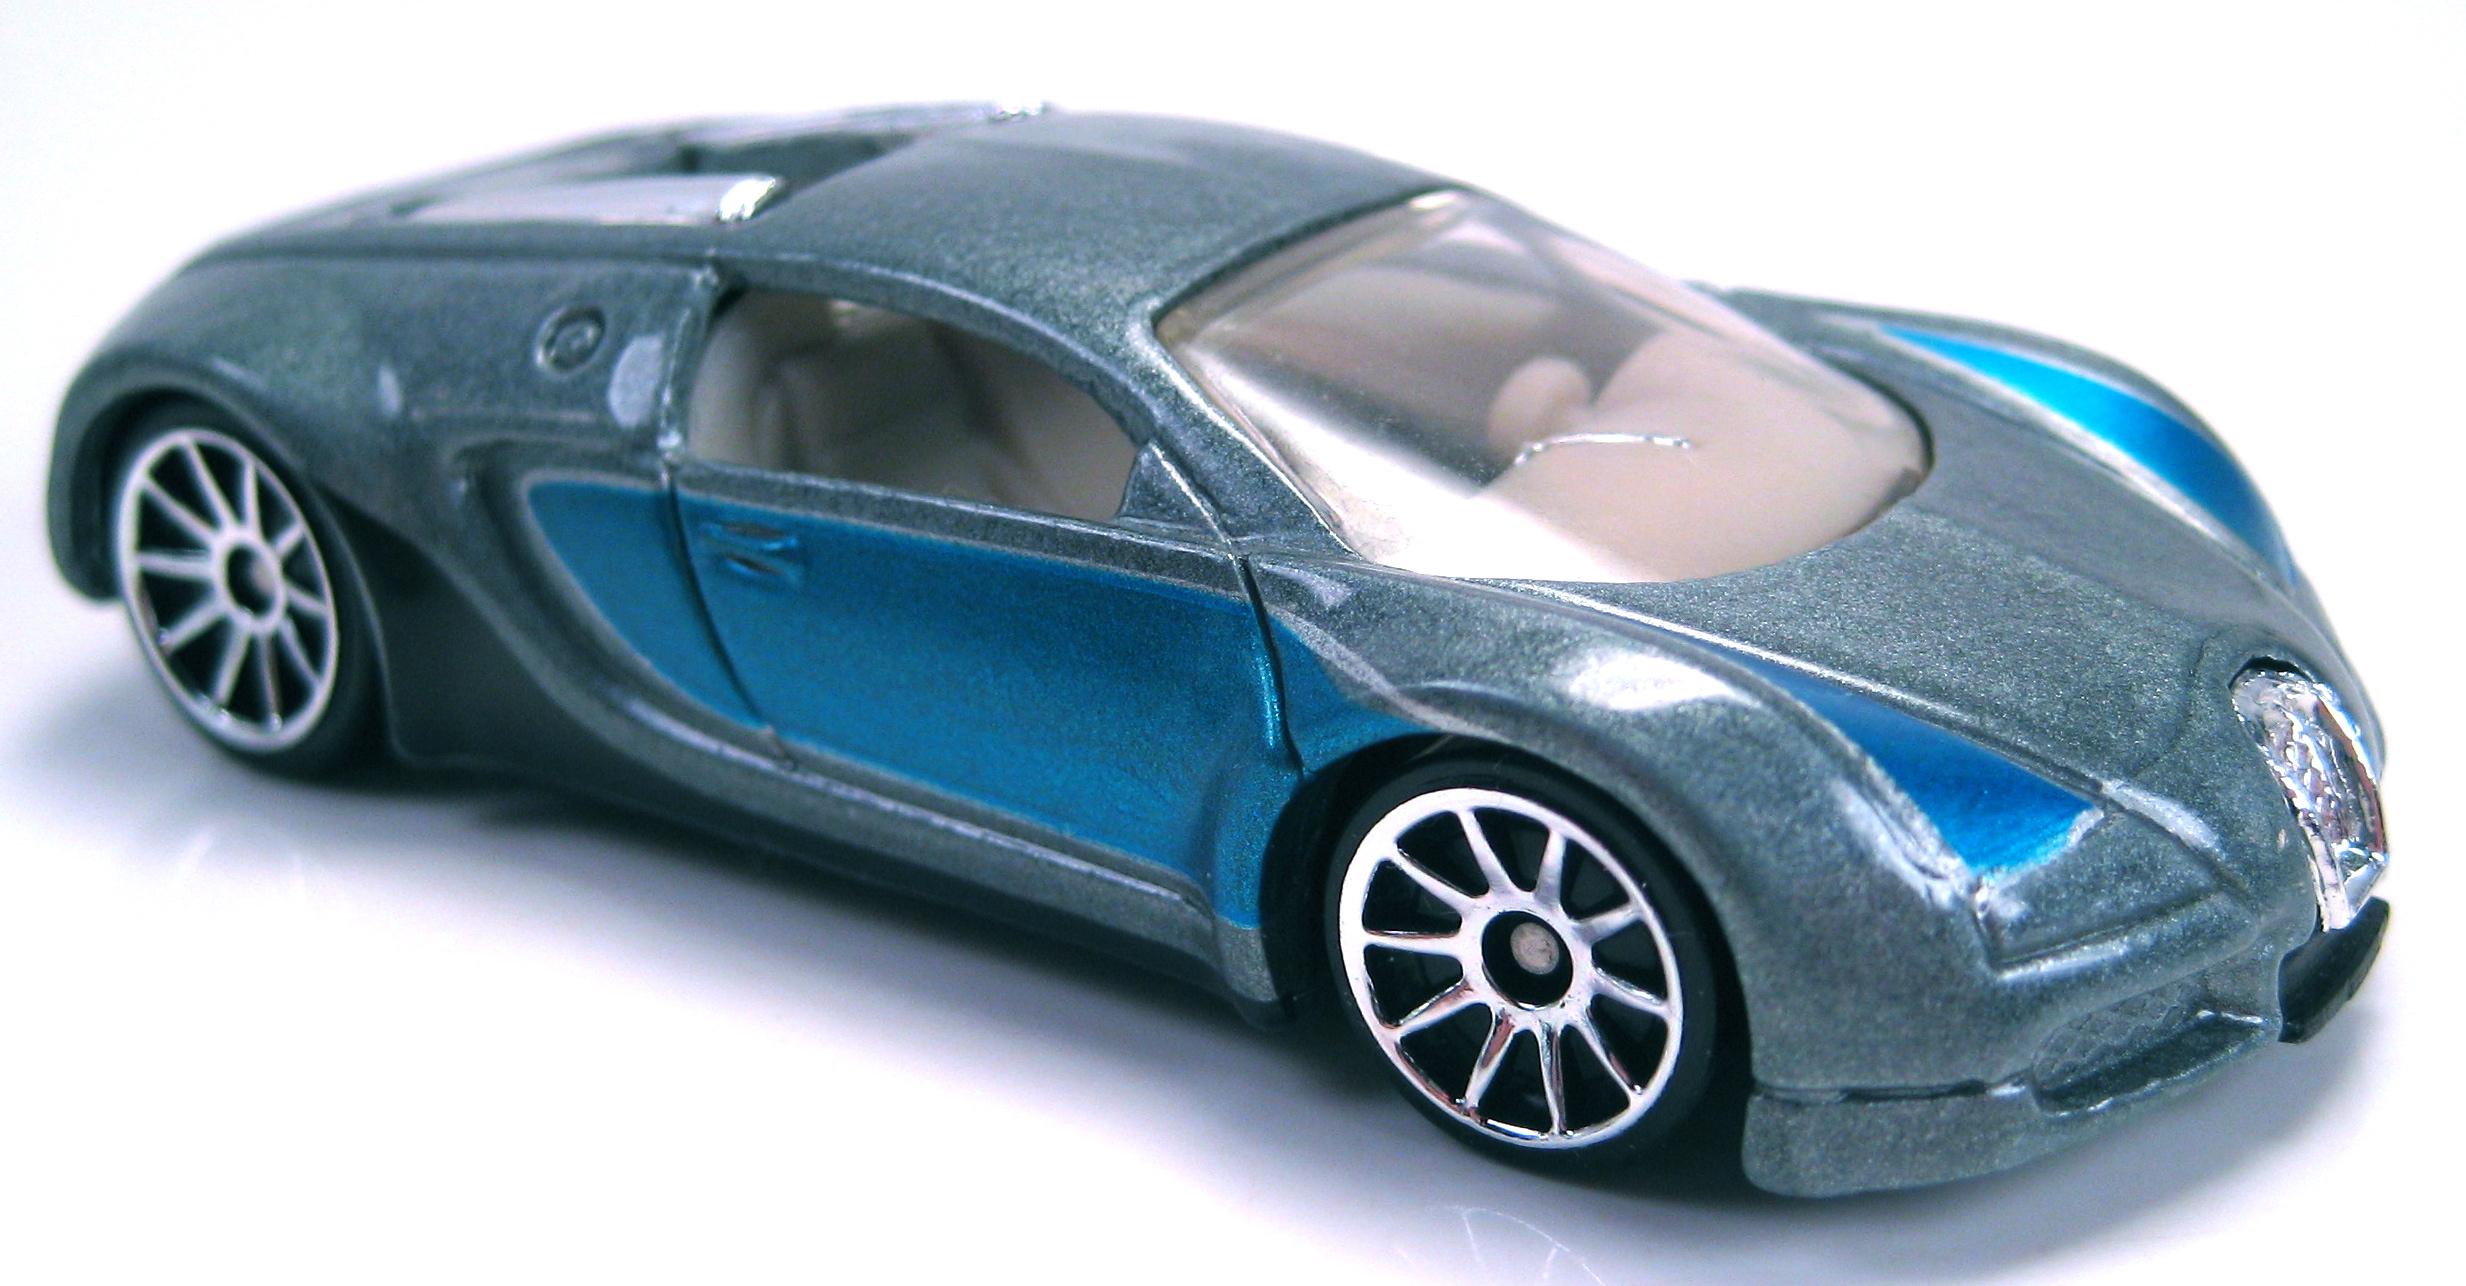 image bugatti veyron grey blue 10sp wheels 2006 jpg hot wheels wiki. Black Bedroom Furniture Sets. Home Design Ideas